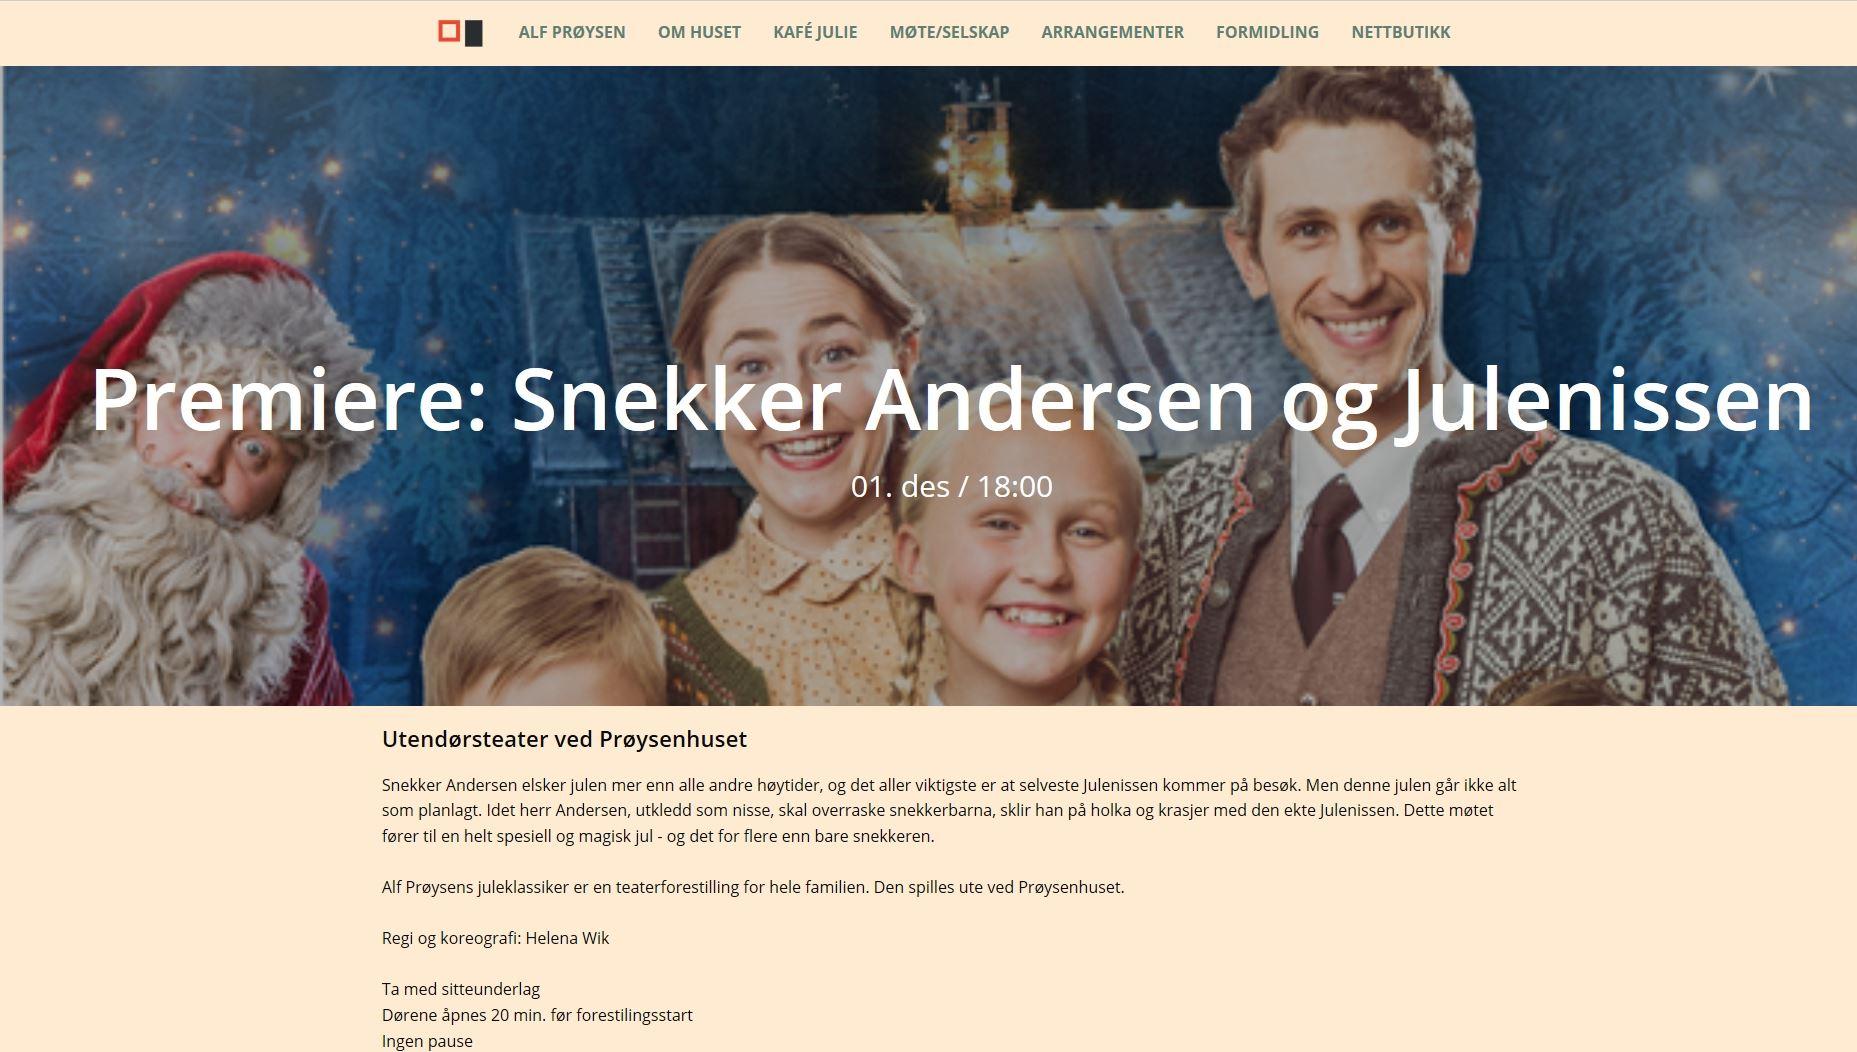 Carpenter Andersen and Santa Claus